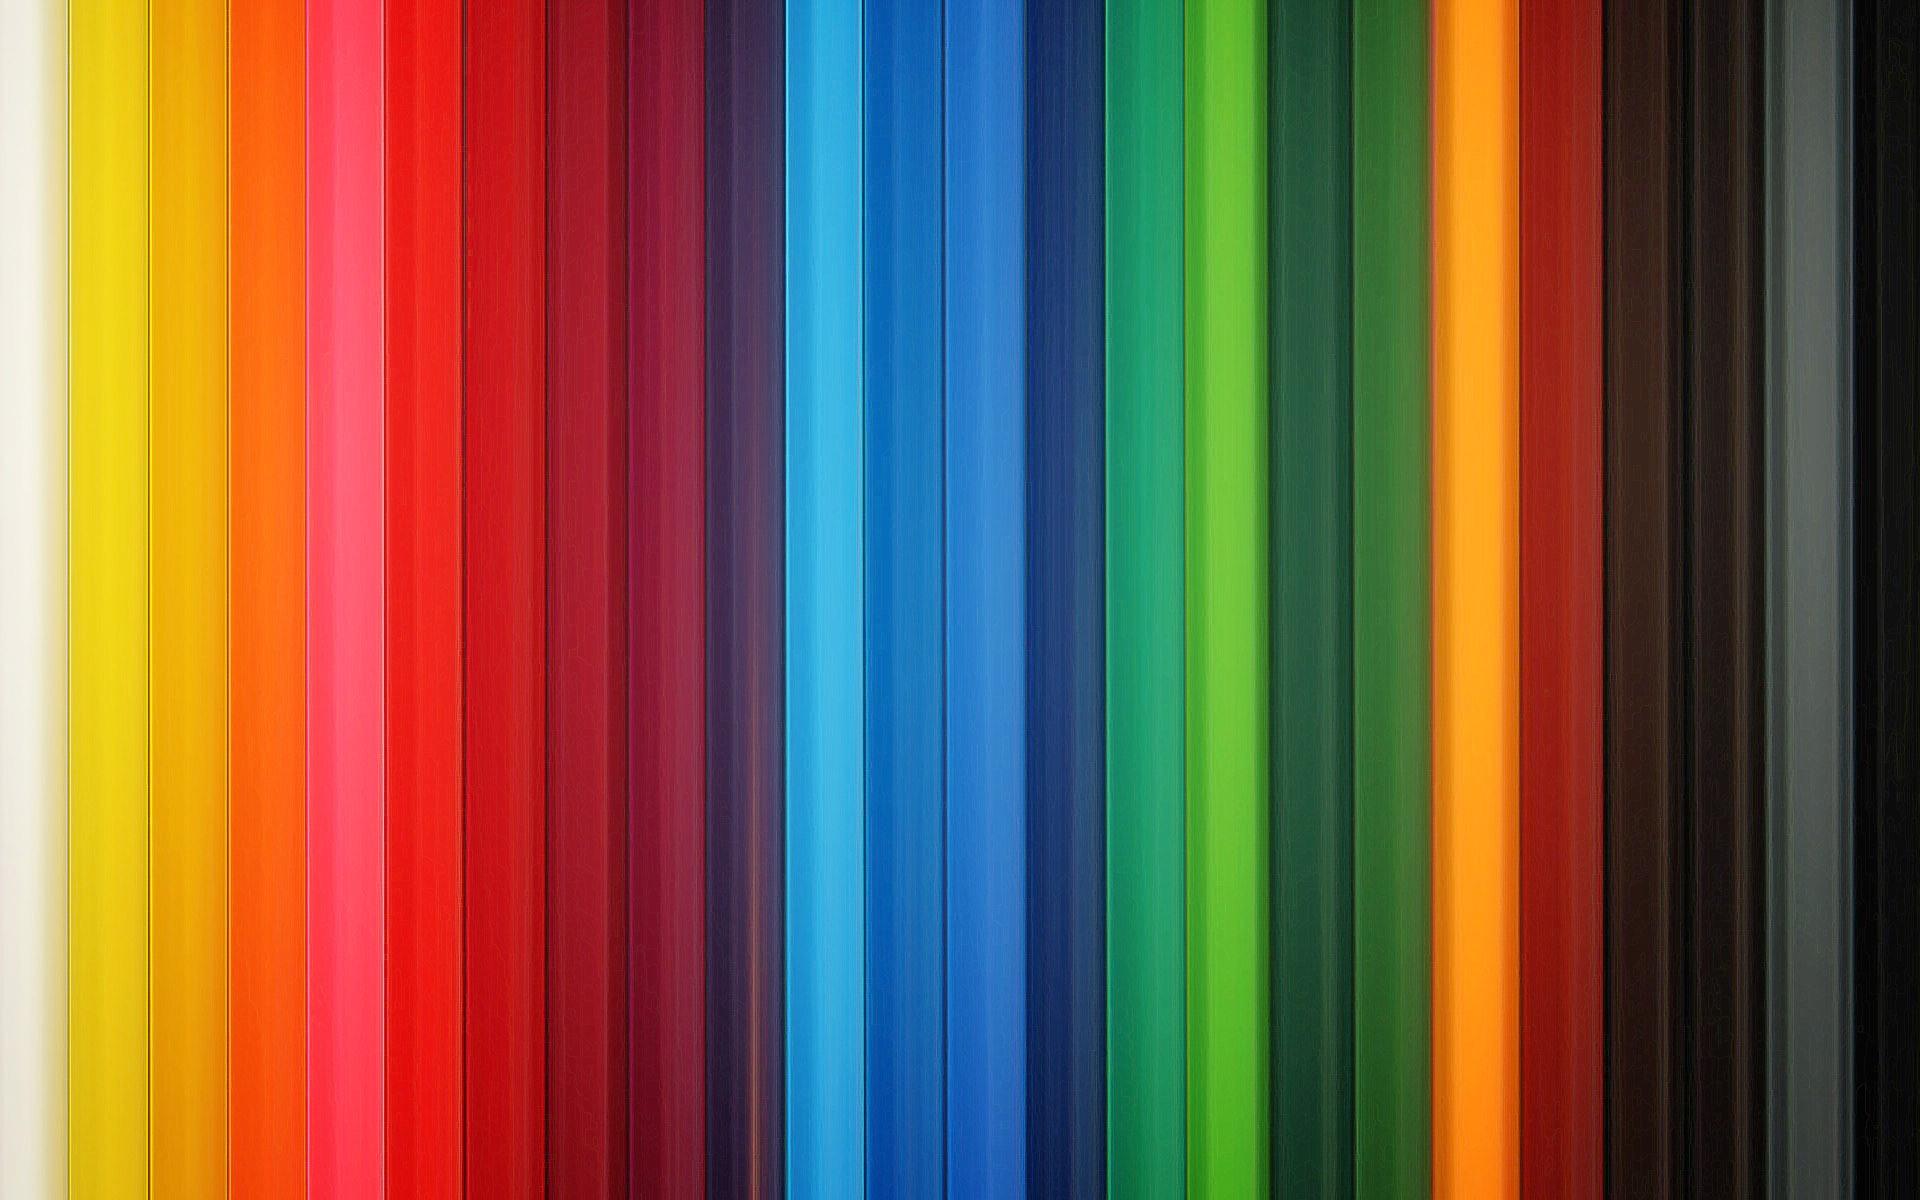 Color Stripes wallpaper   196026 1920x1200